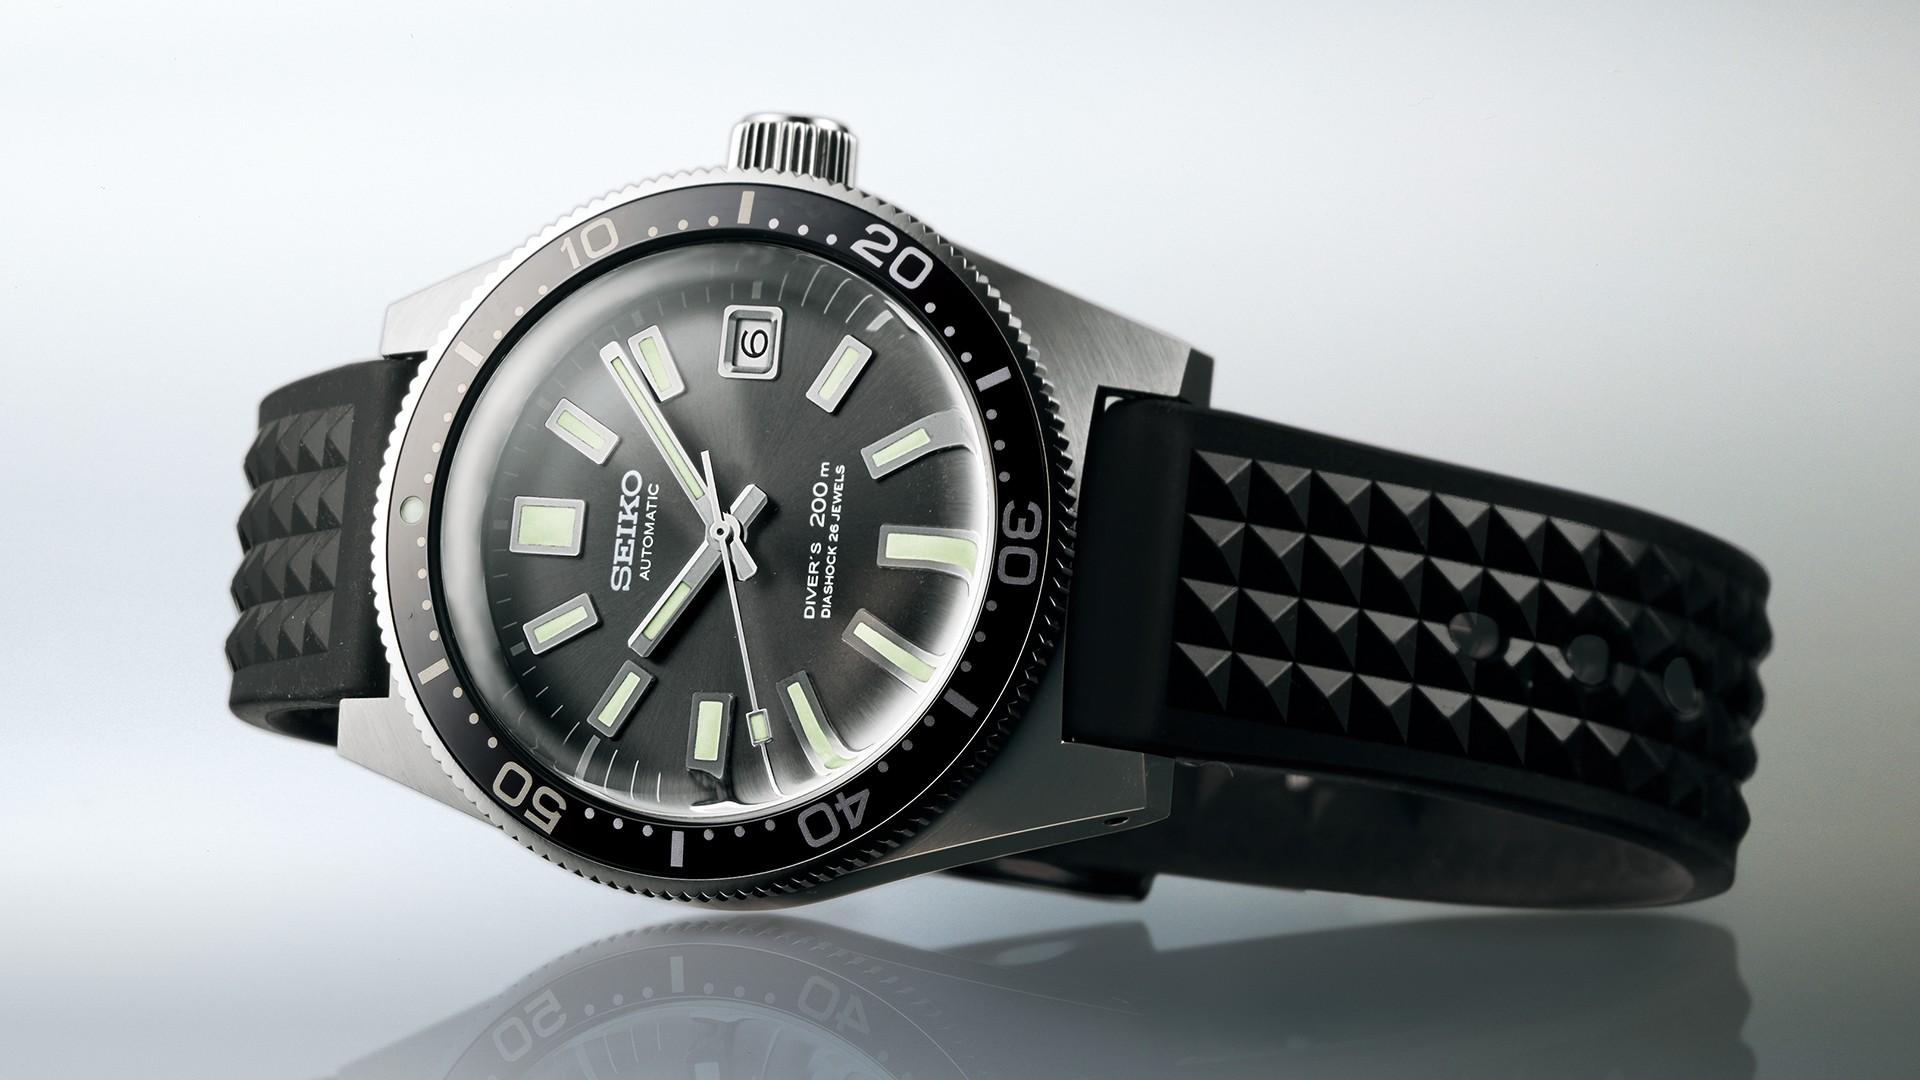 Seiko Prospex Diver SLA017 watch